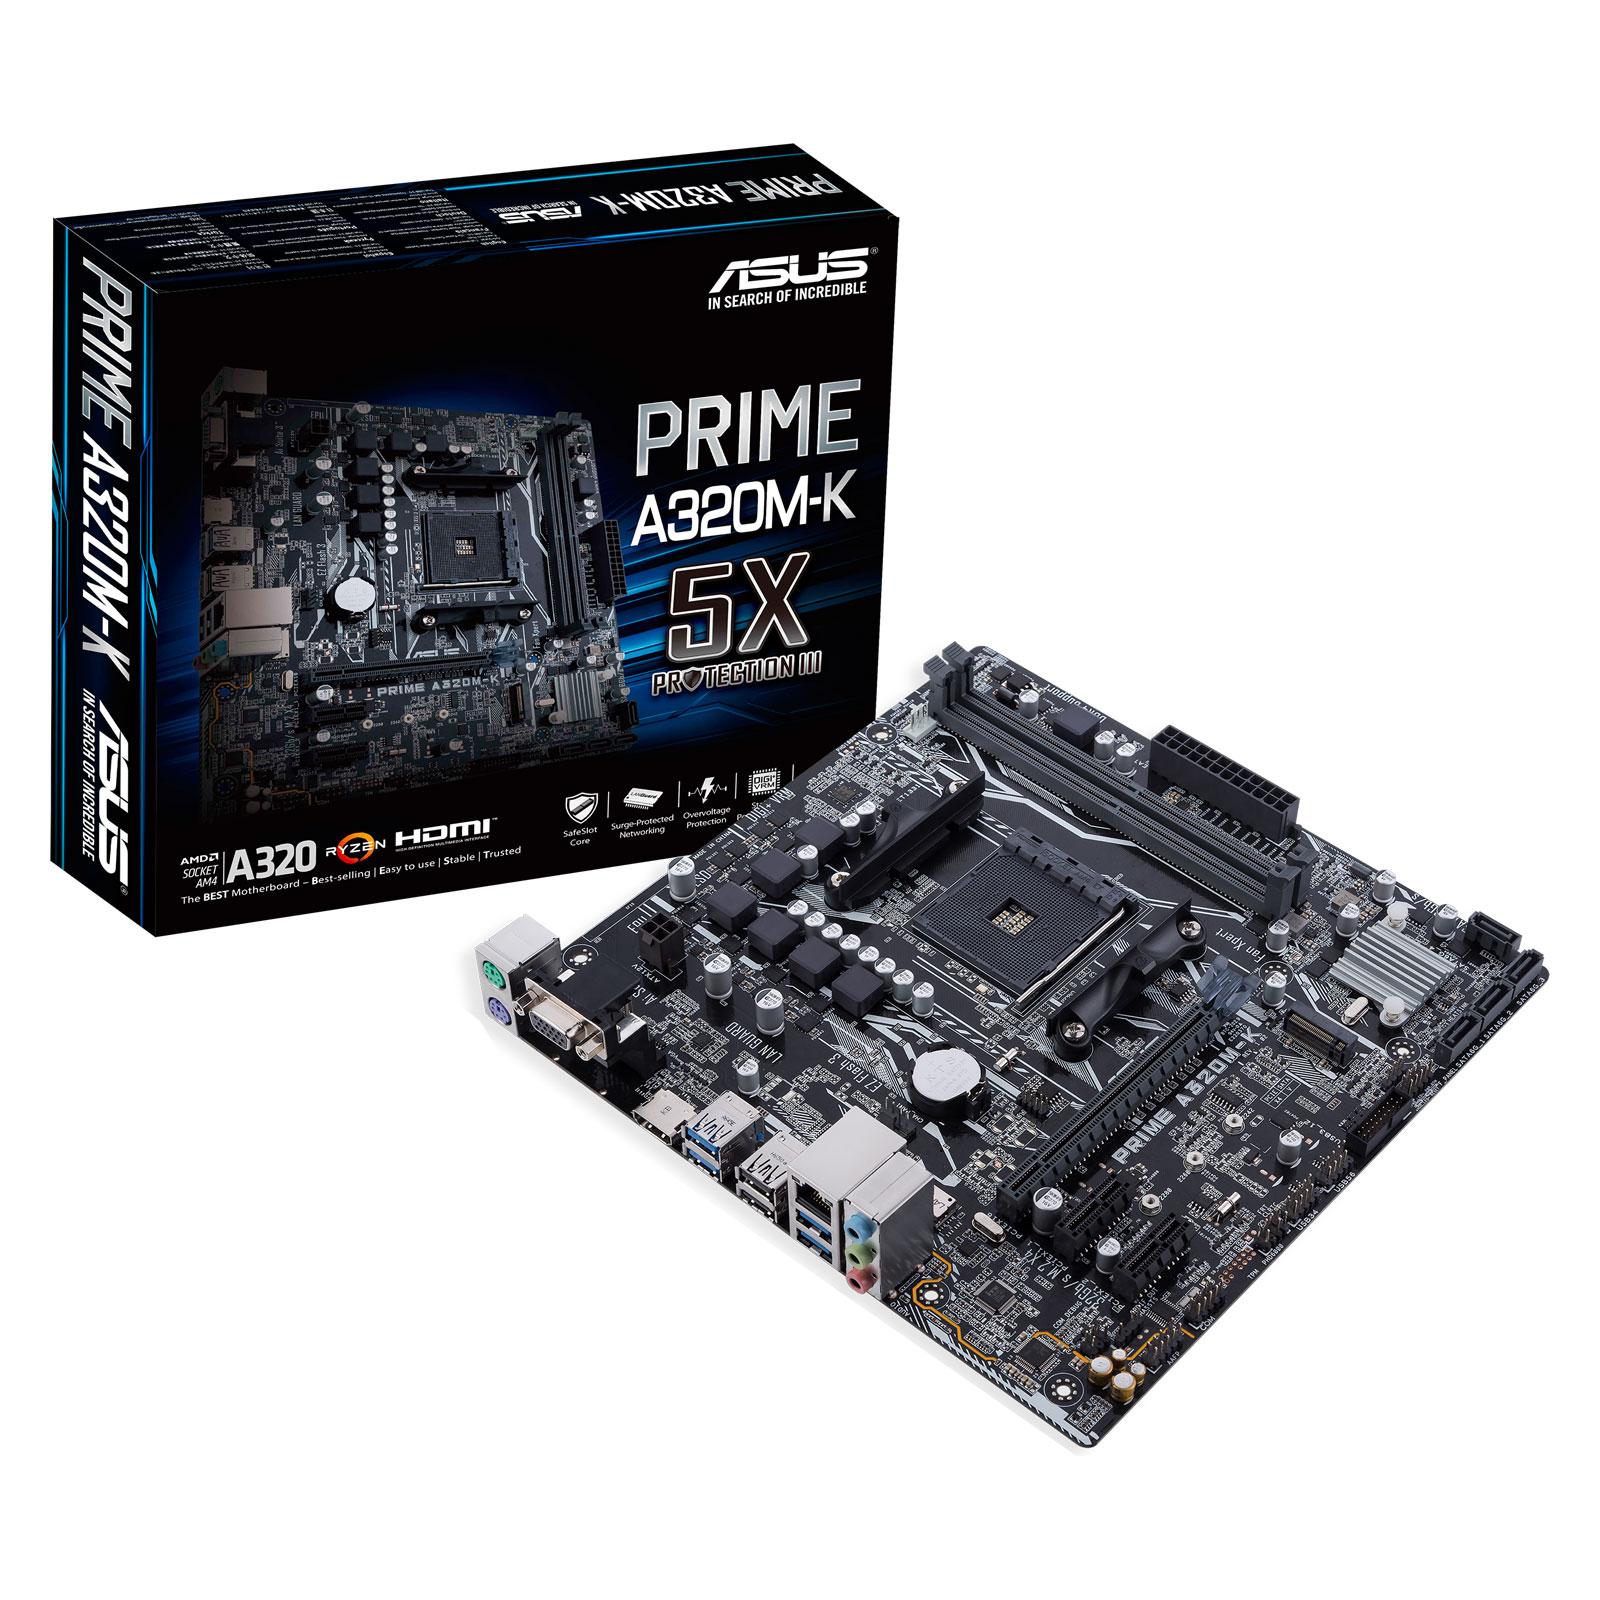 Carte mère ASUS PRIME A320M-K Carte mère Micro ATX Socket AM4 AMD A320 - 2x DDR4 - SATA 6Gb/s + M.2 - 1x PCI-Express 3.0 16x